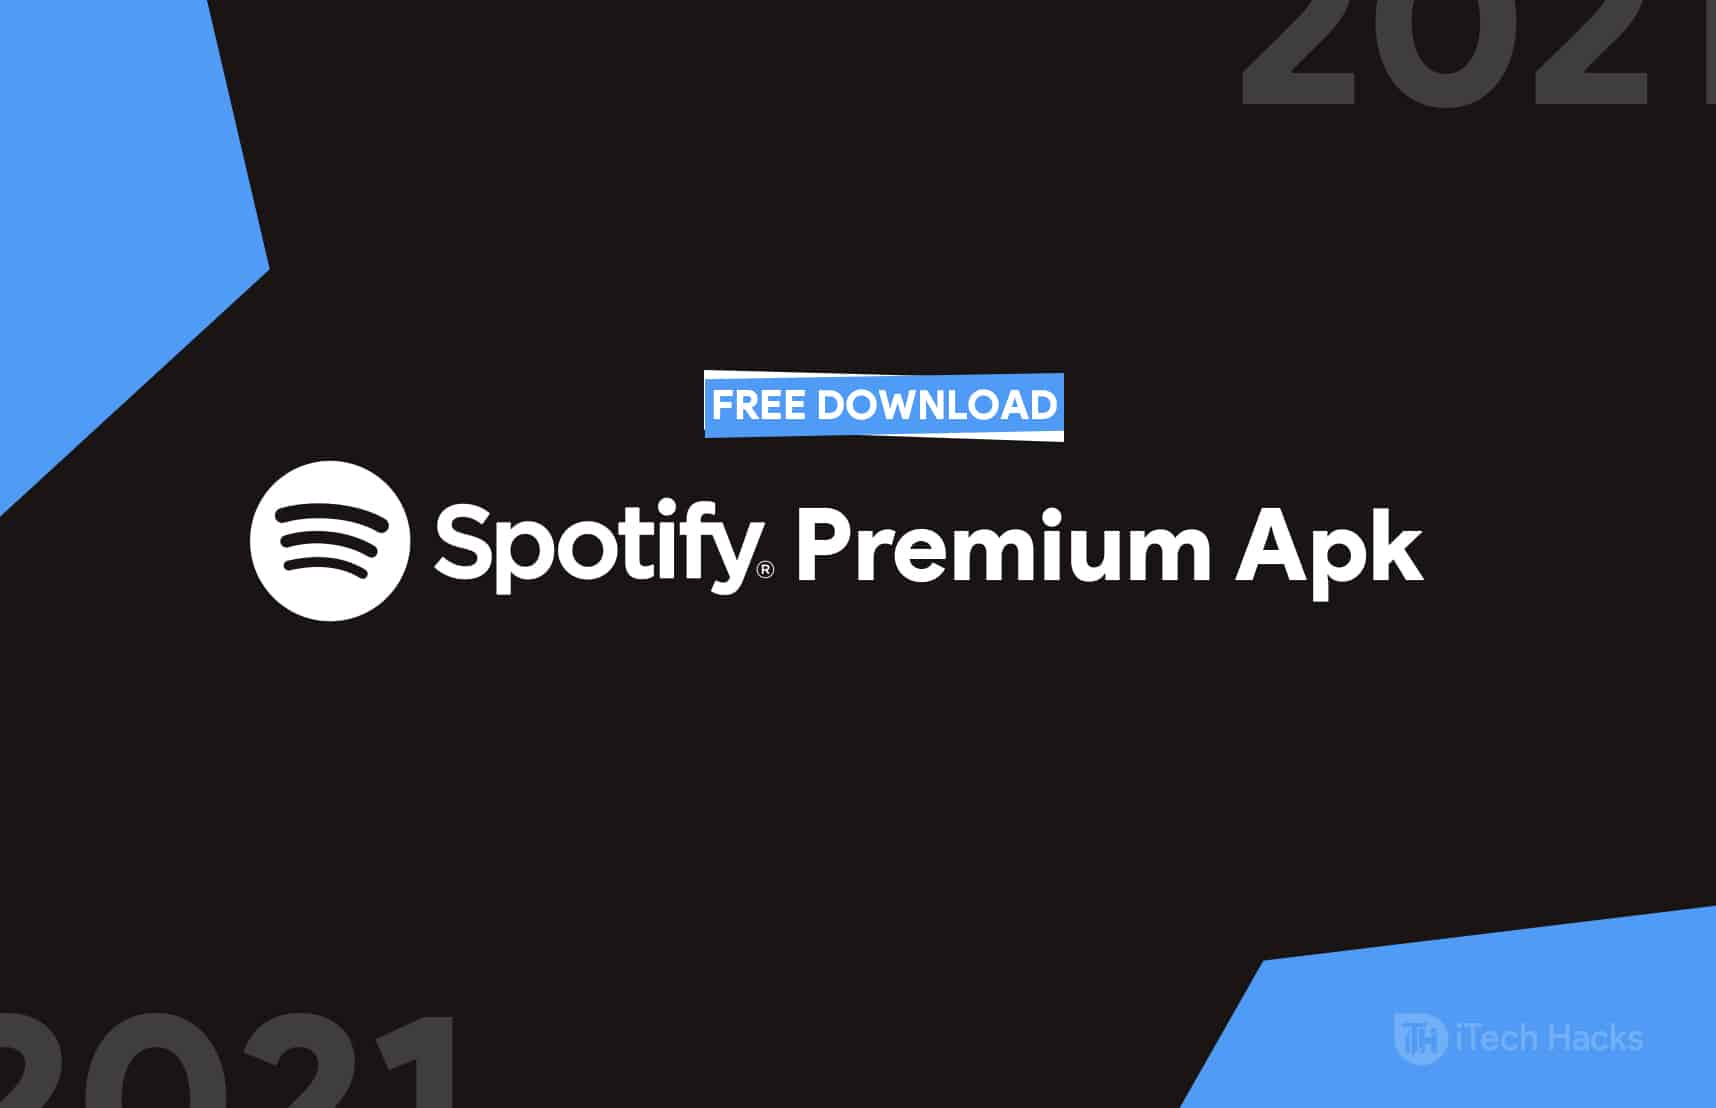 Spotify 8.6.298 Premium Apk Free Download Offline MOD 2021